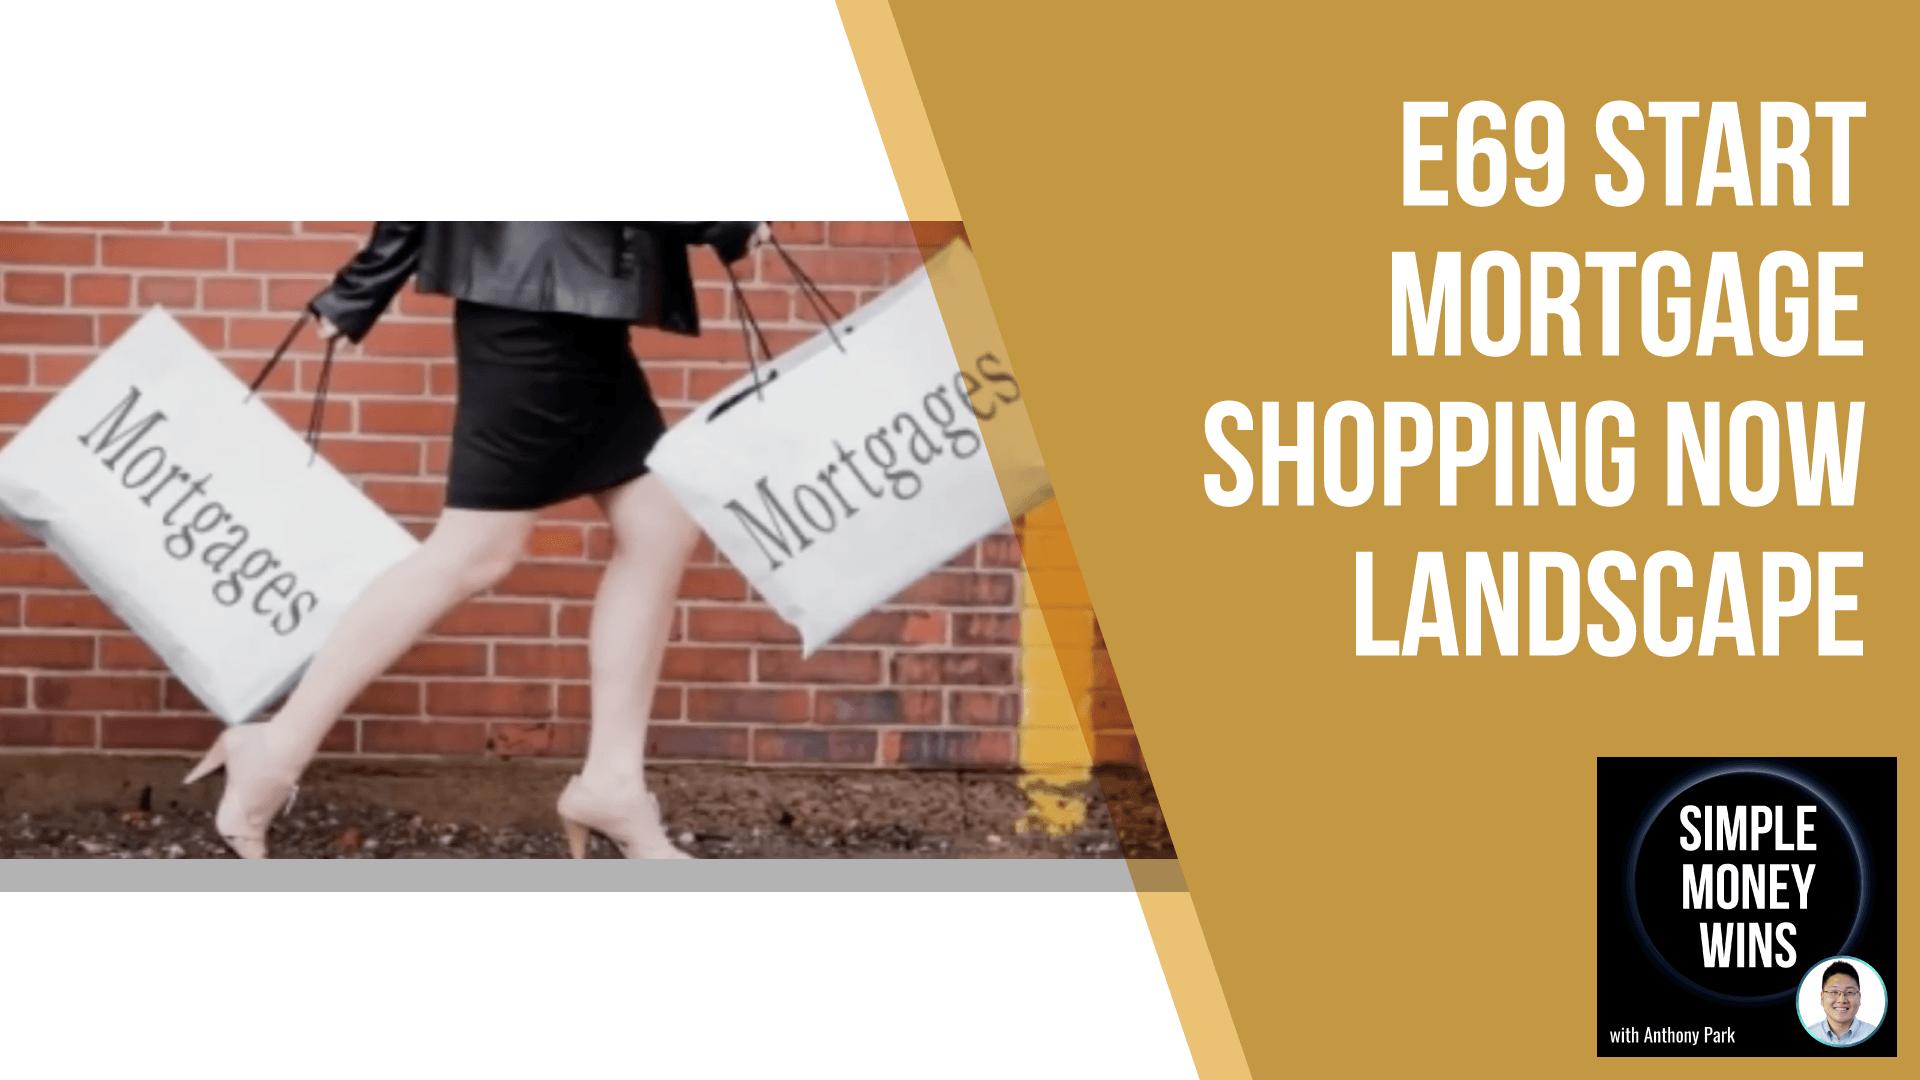 E69 Start Mortgage Shopping Now Landscape